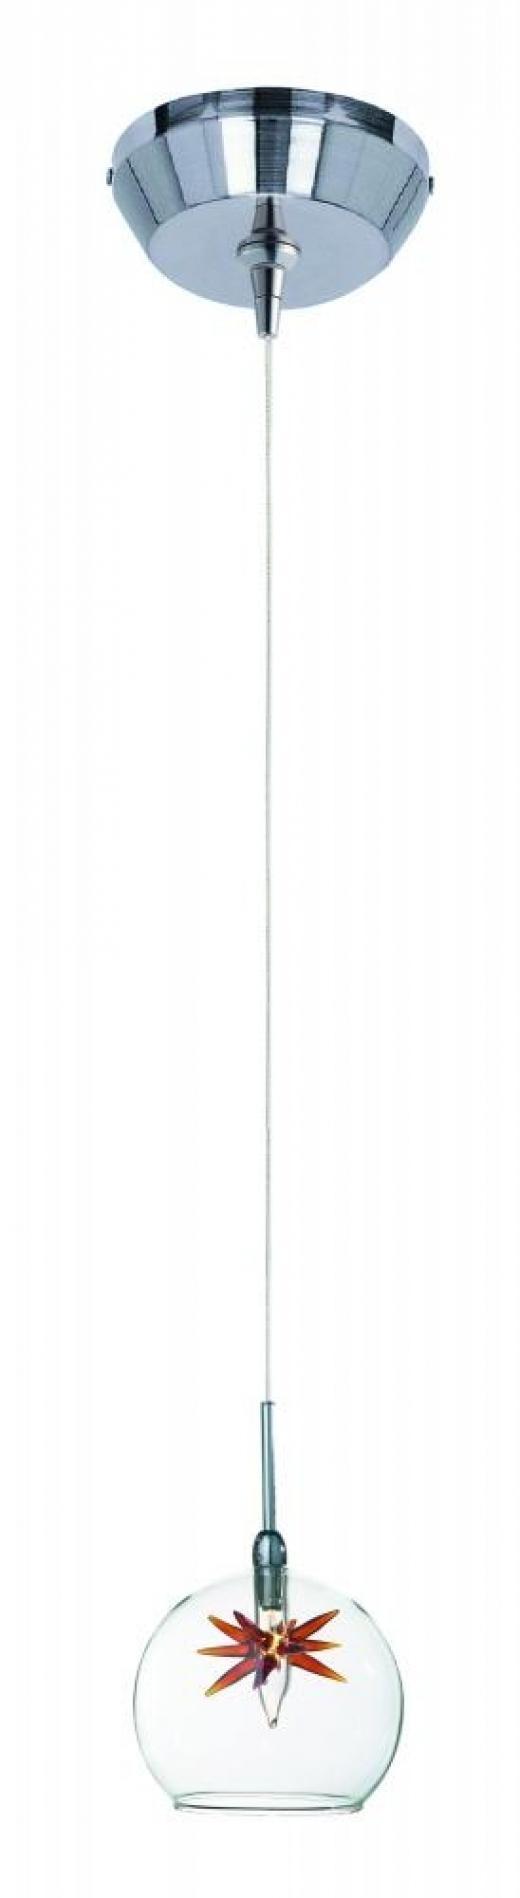 Starburst 1-Light RapidJack Pendant and Canopy-E94472-25